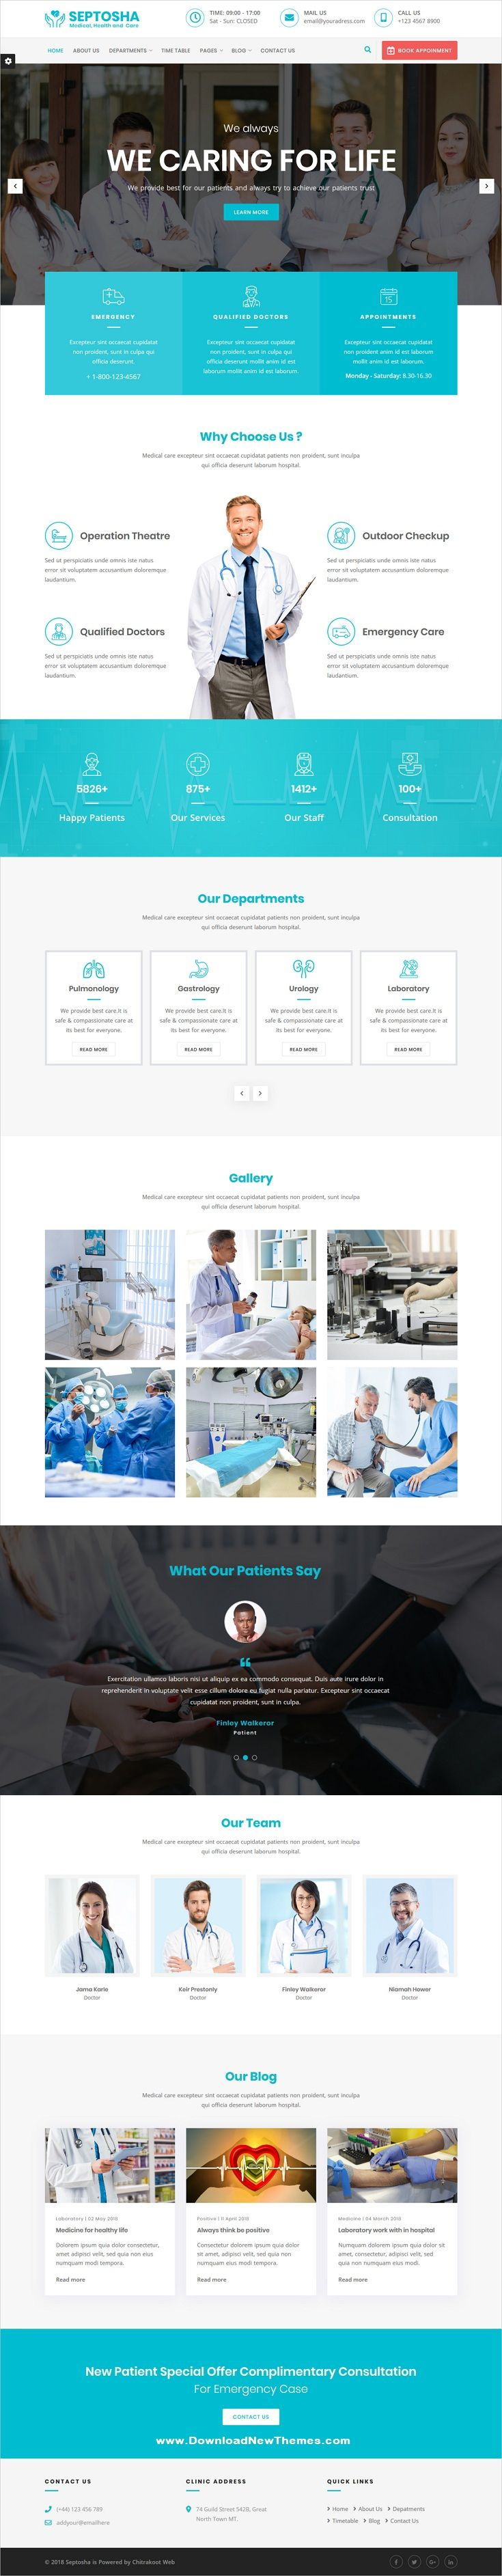 Septosha is a clean, elegant and modern design responsive